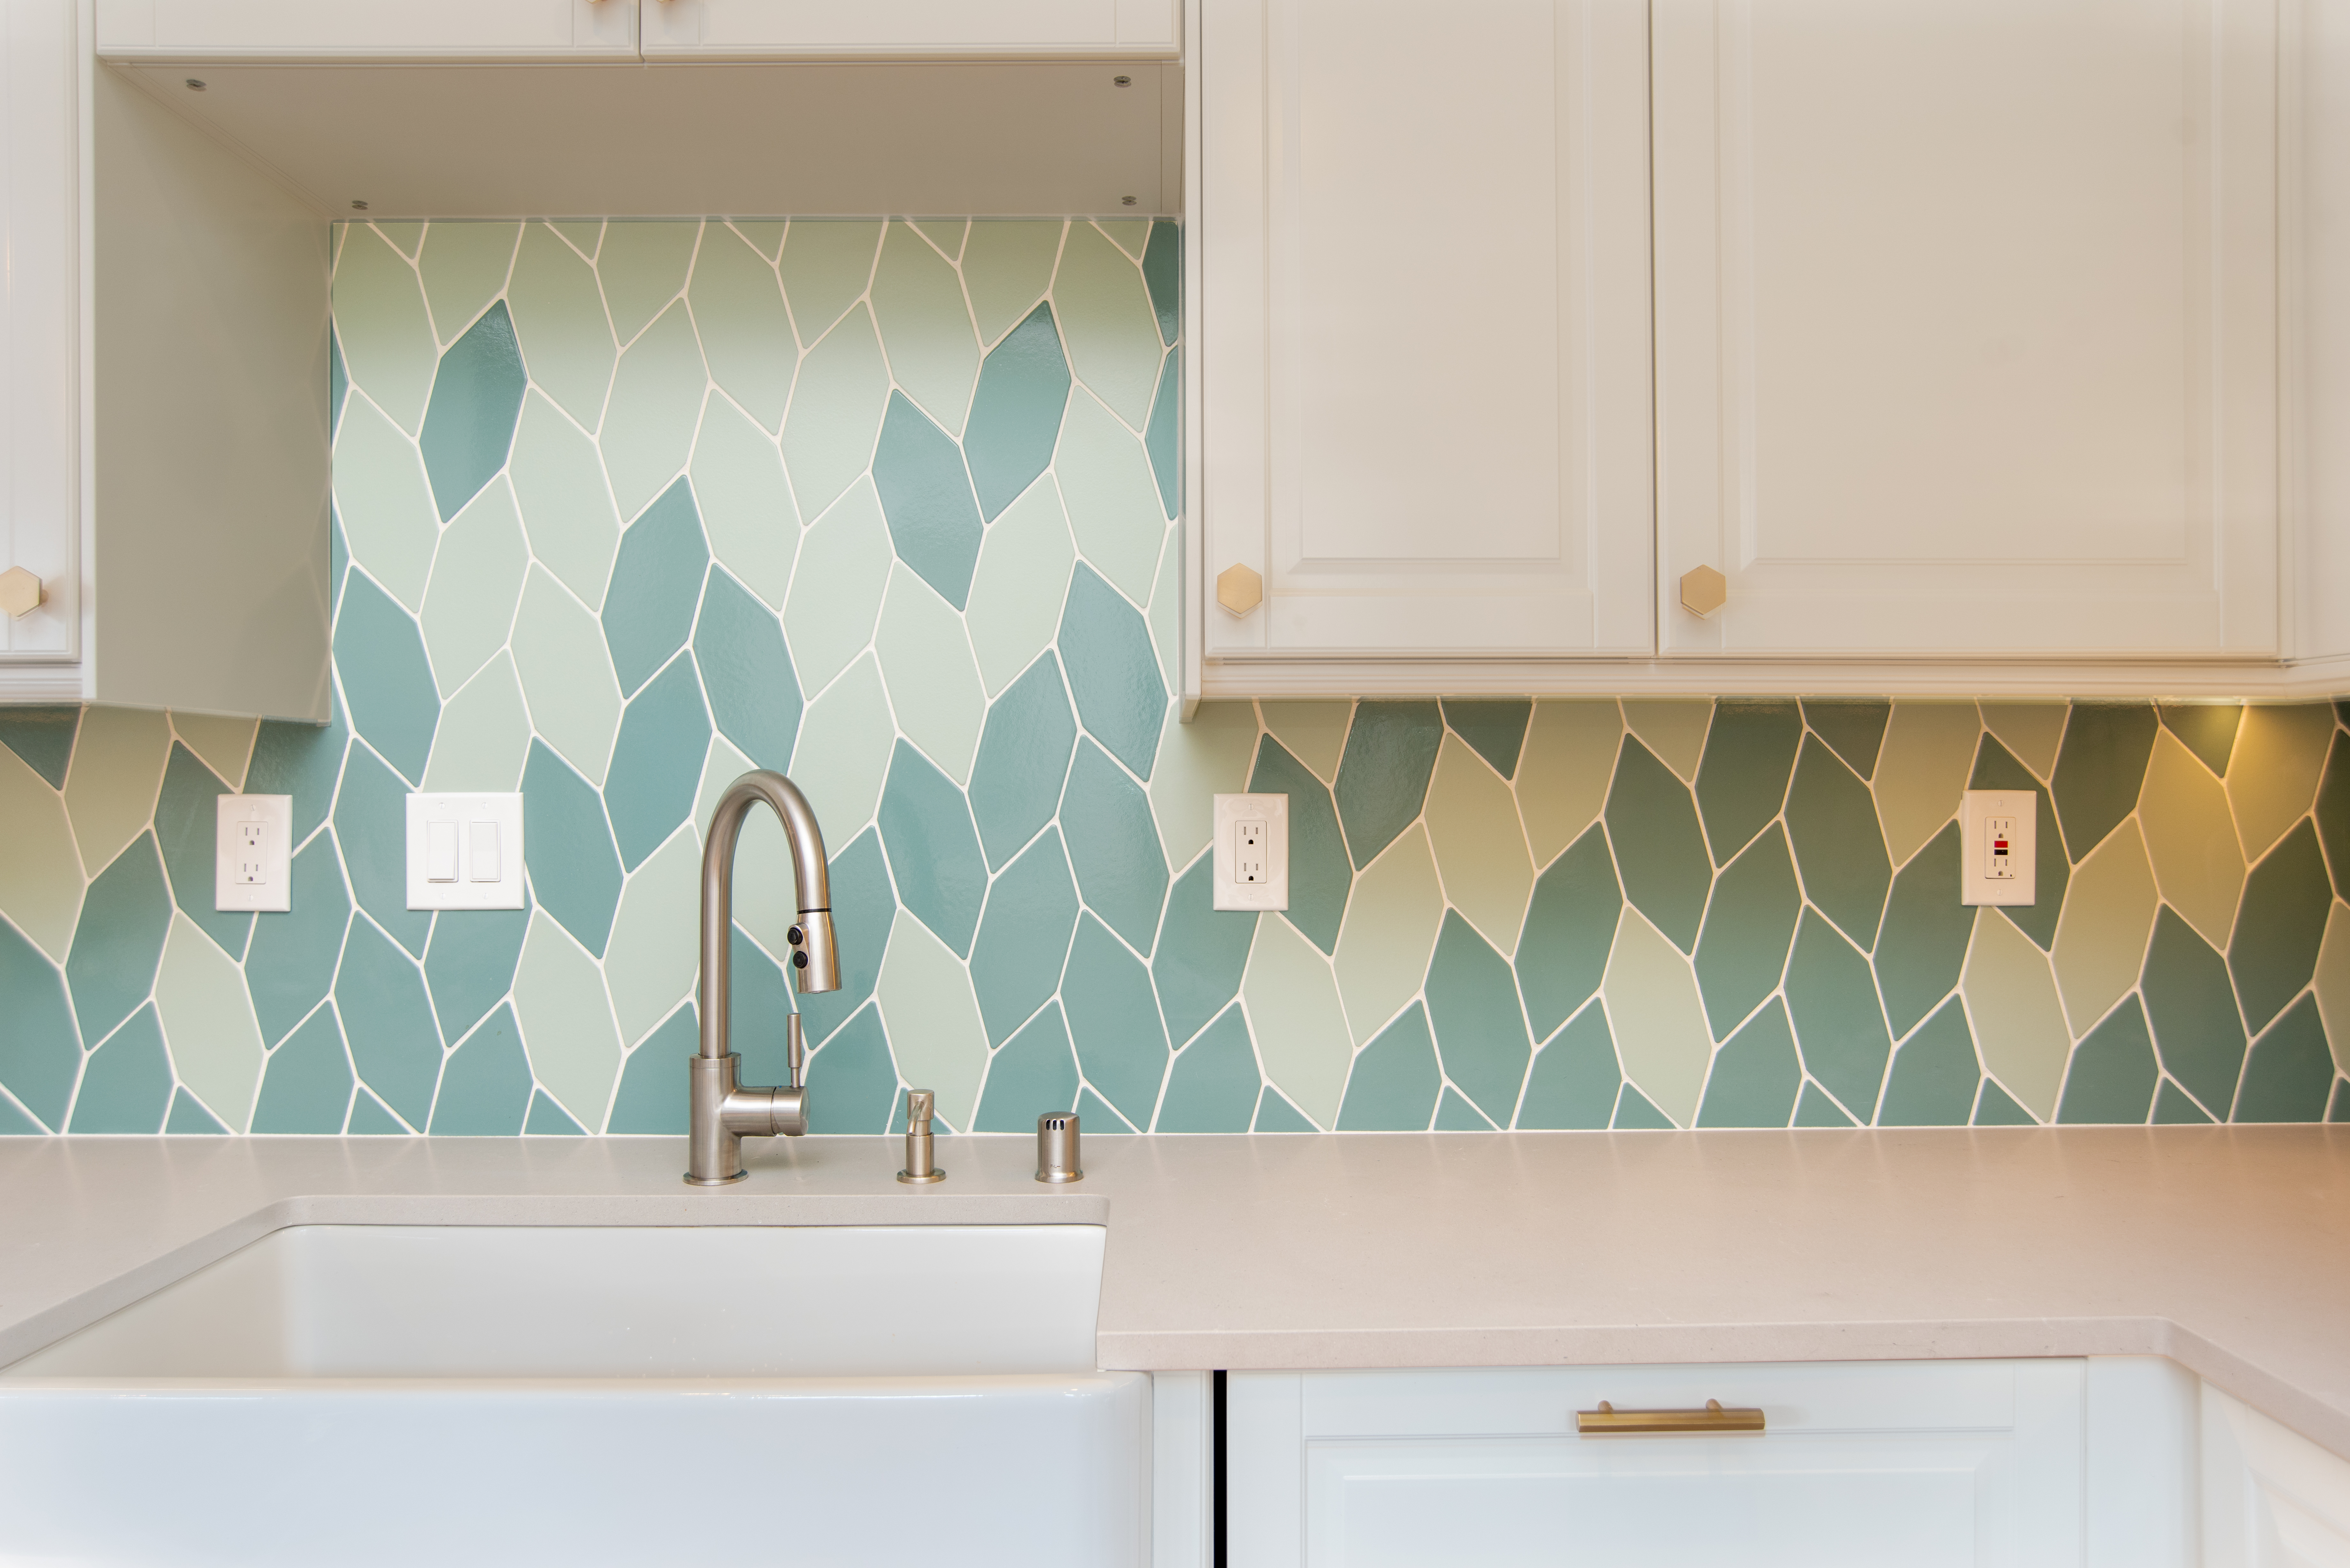 Fireclay Tile Sea Glass + Jade Picket Braid Backsplash